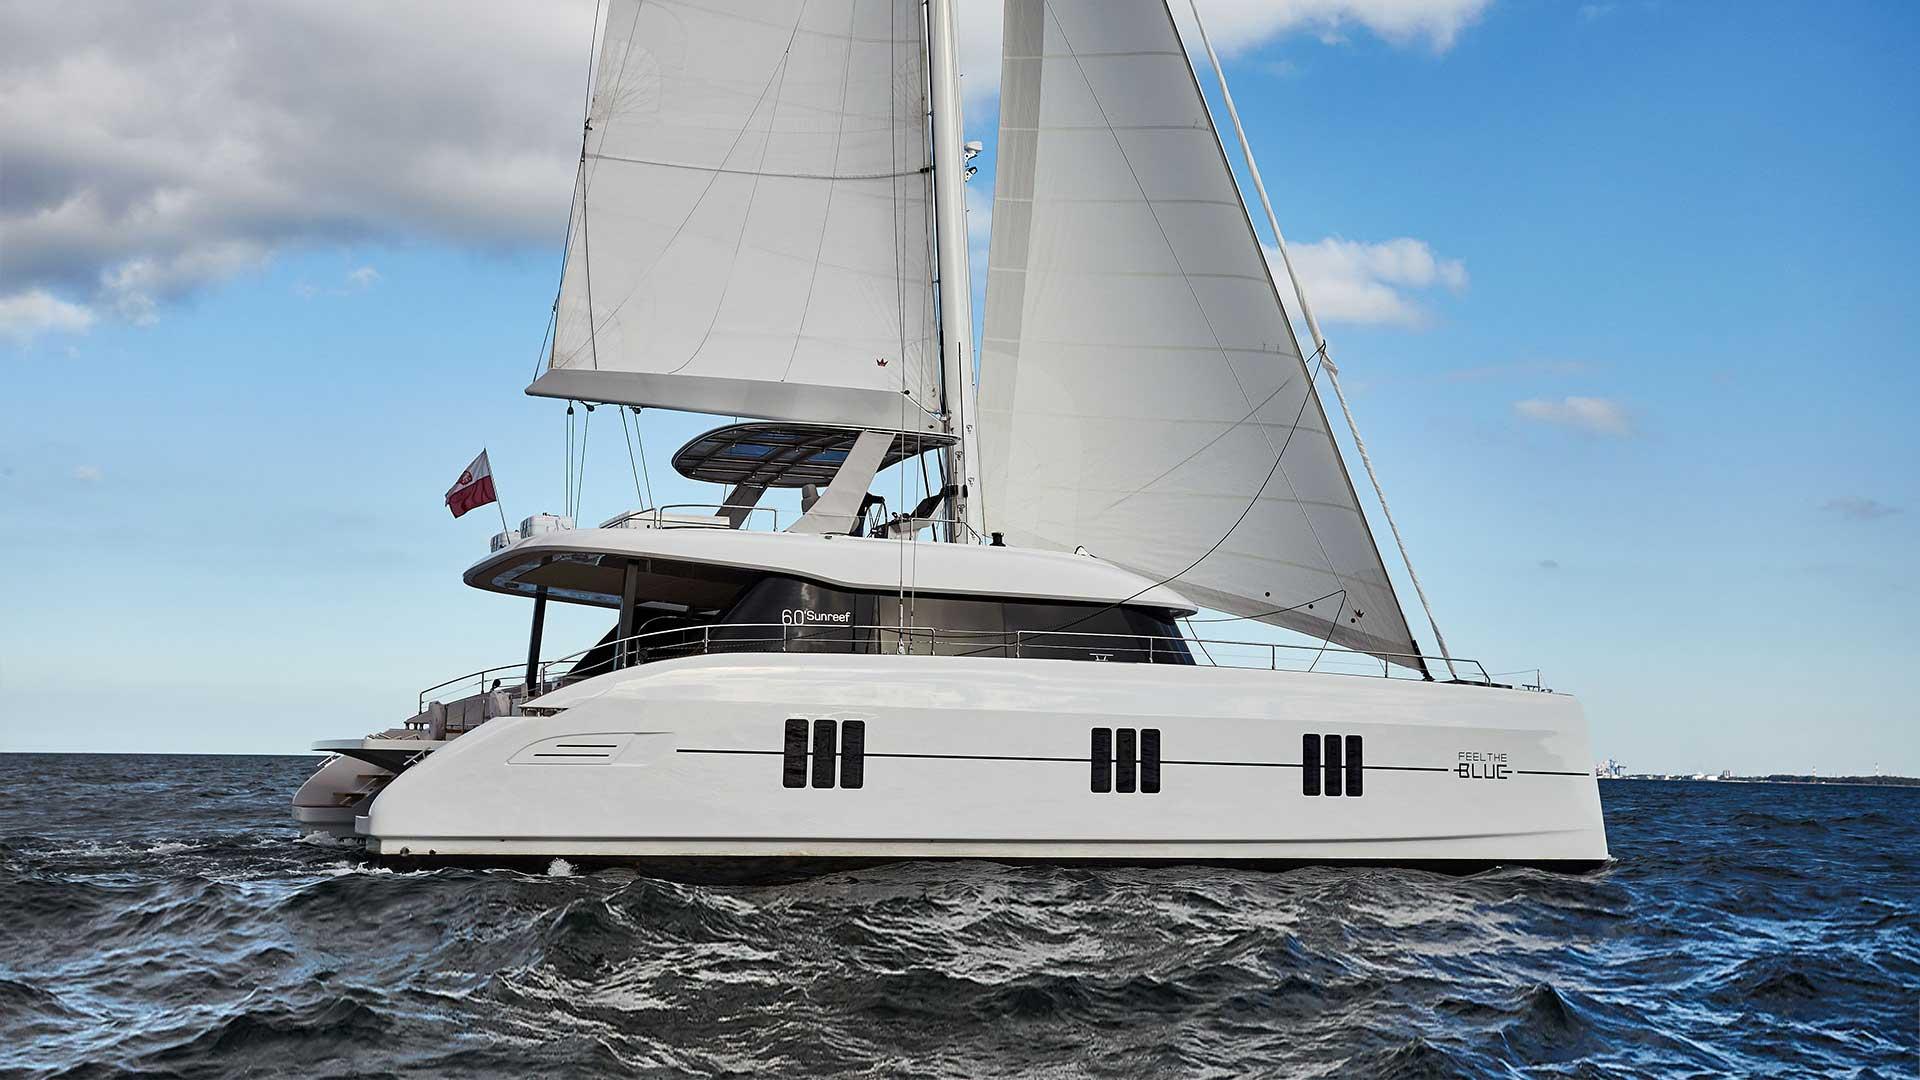 Alquiler de catamaranes de lujo